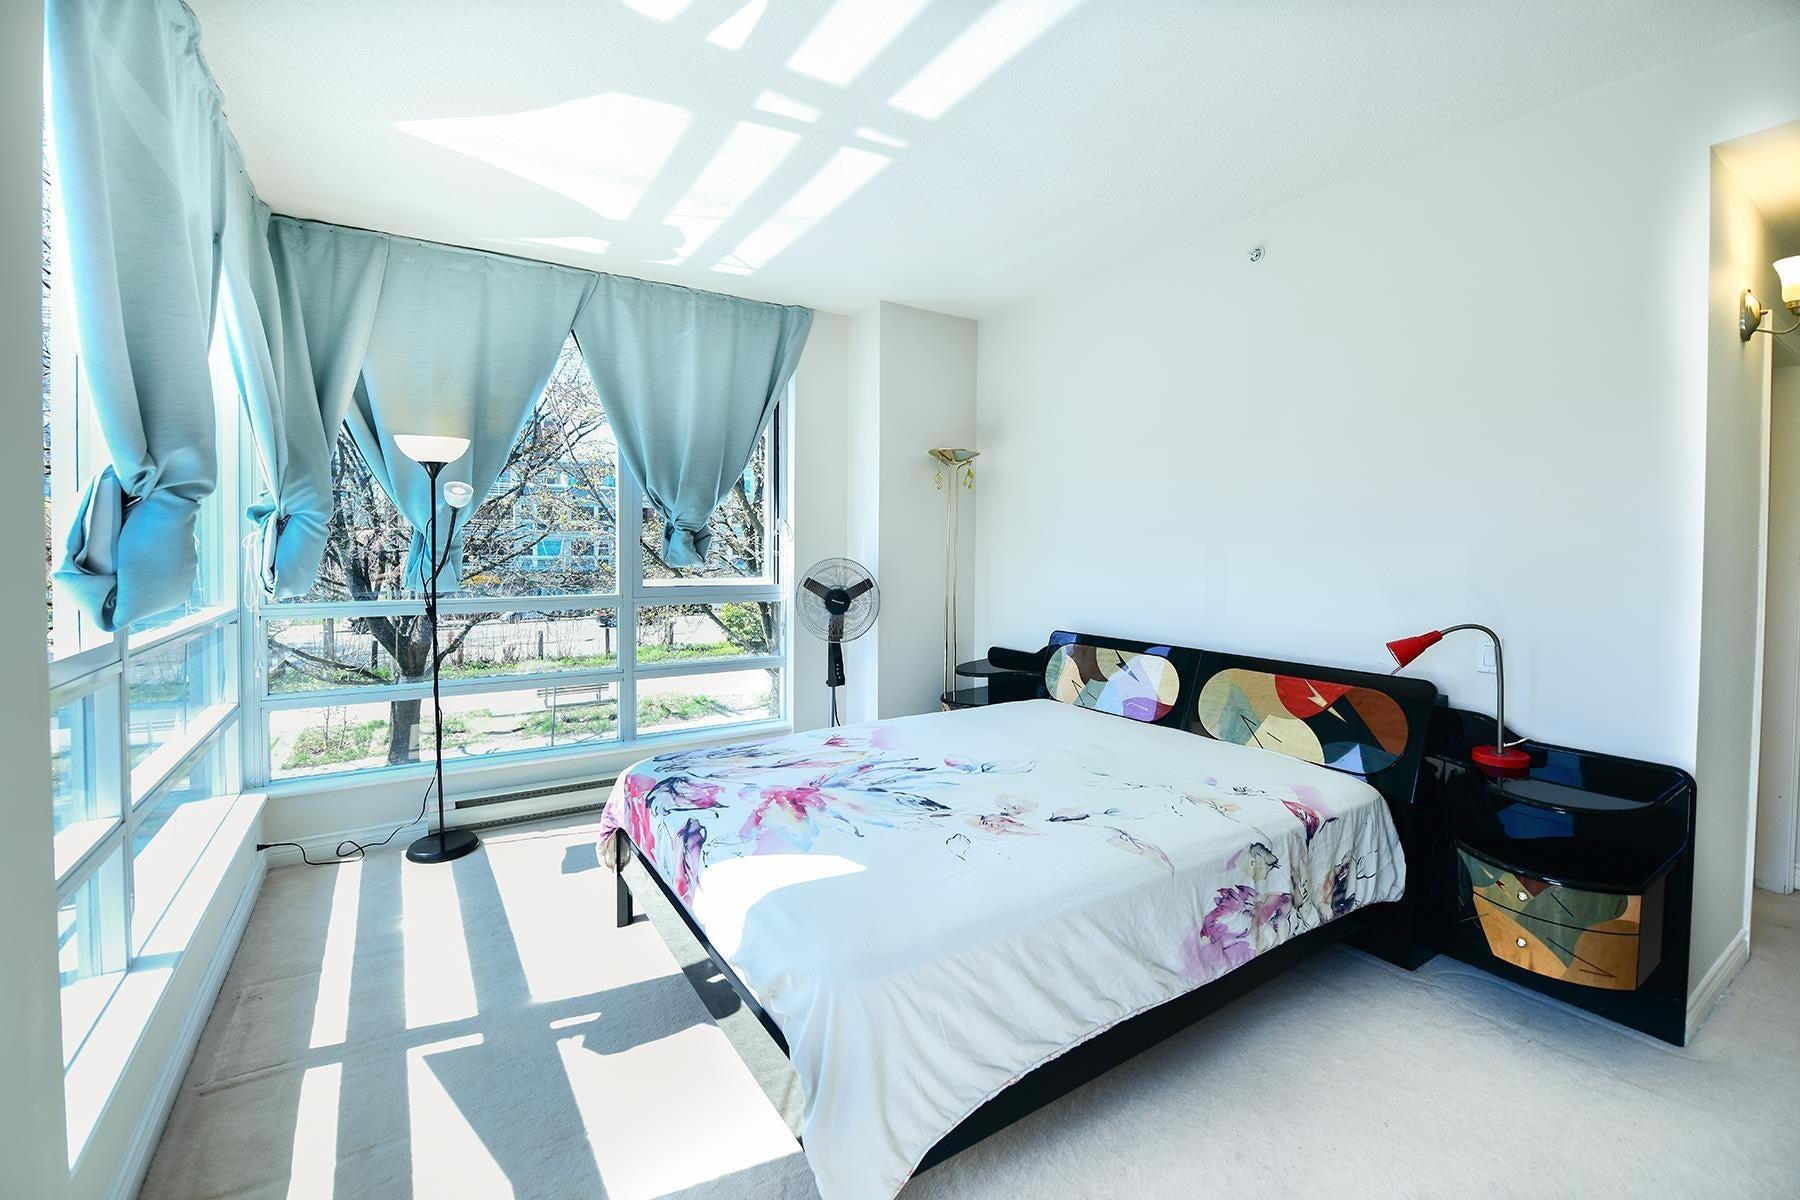 204 5790 EAST BOULEVARD - Kerrisdale Apartment/Condo for sale, 3 Bedrooms (R2604138) - #12